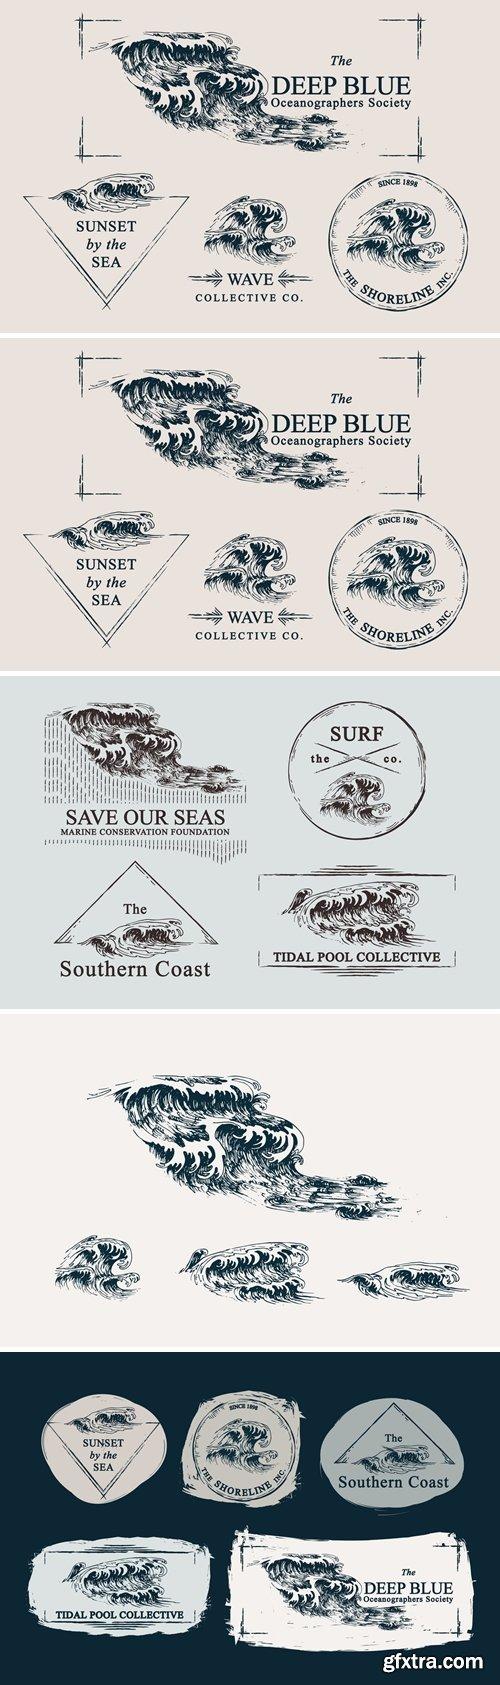 Waves Ocean Illustrations & Templates